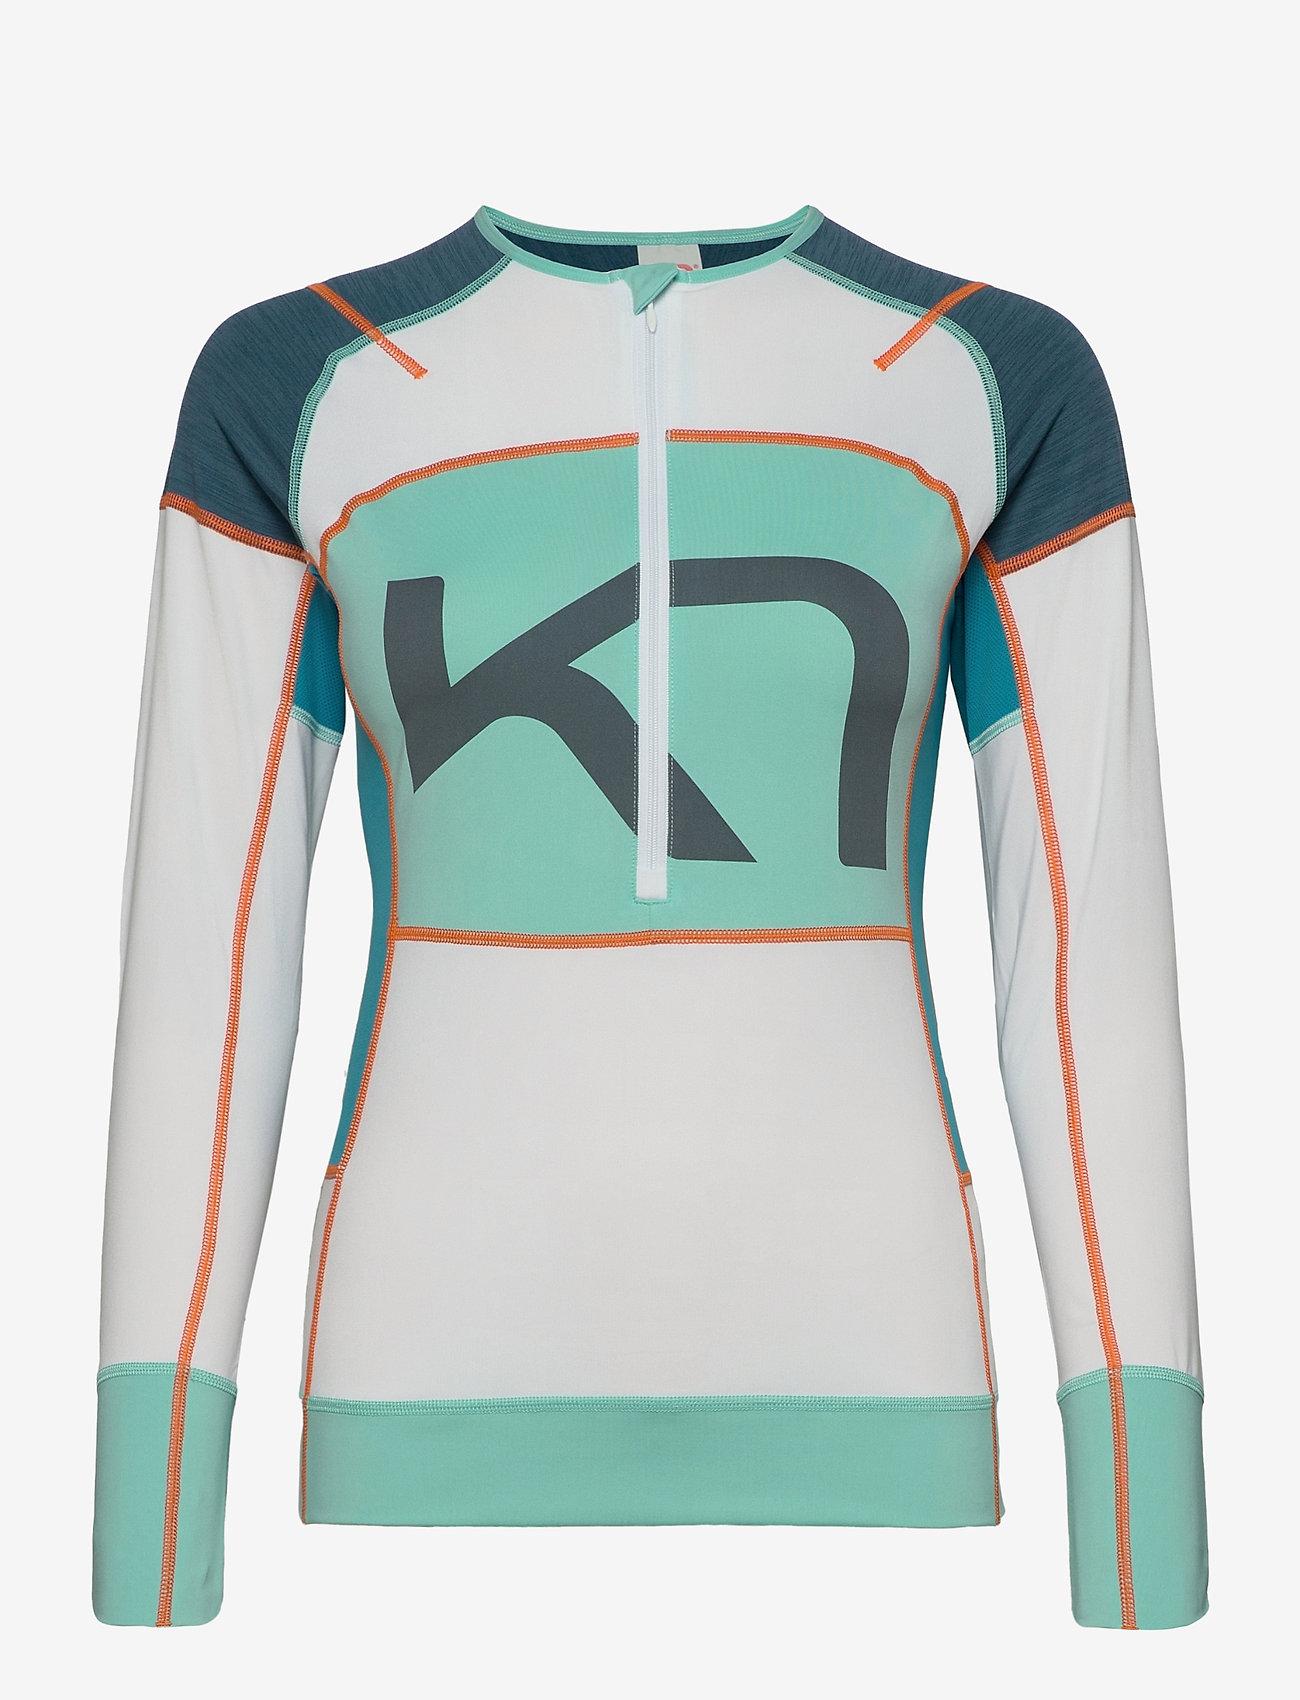 Kari Traa - STIL H/Z - thermo ondershirts - frost - 0